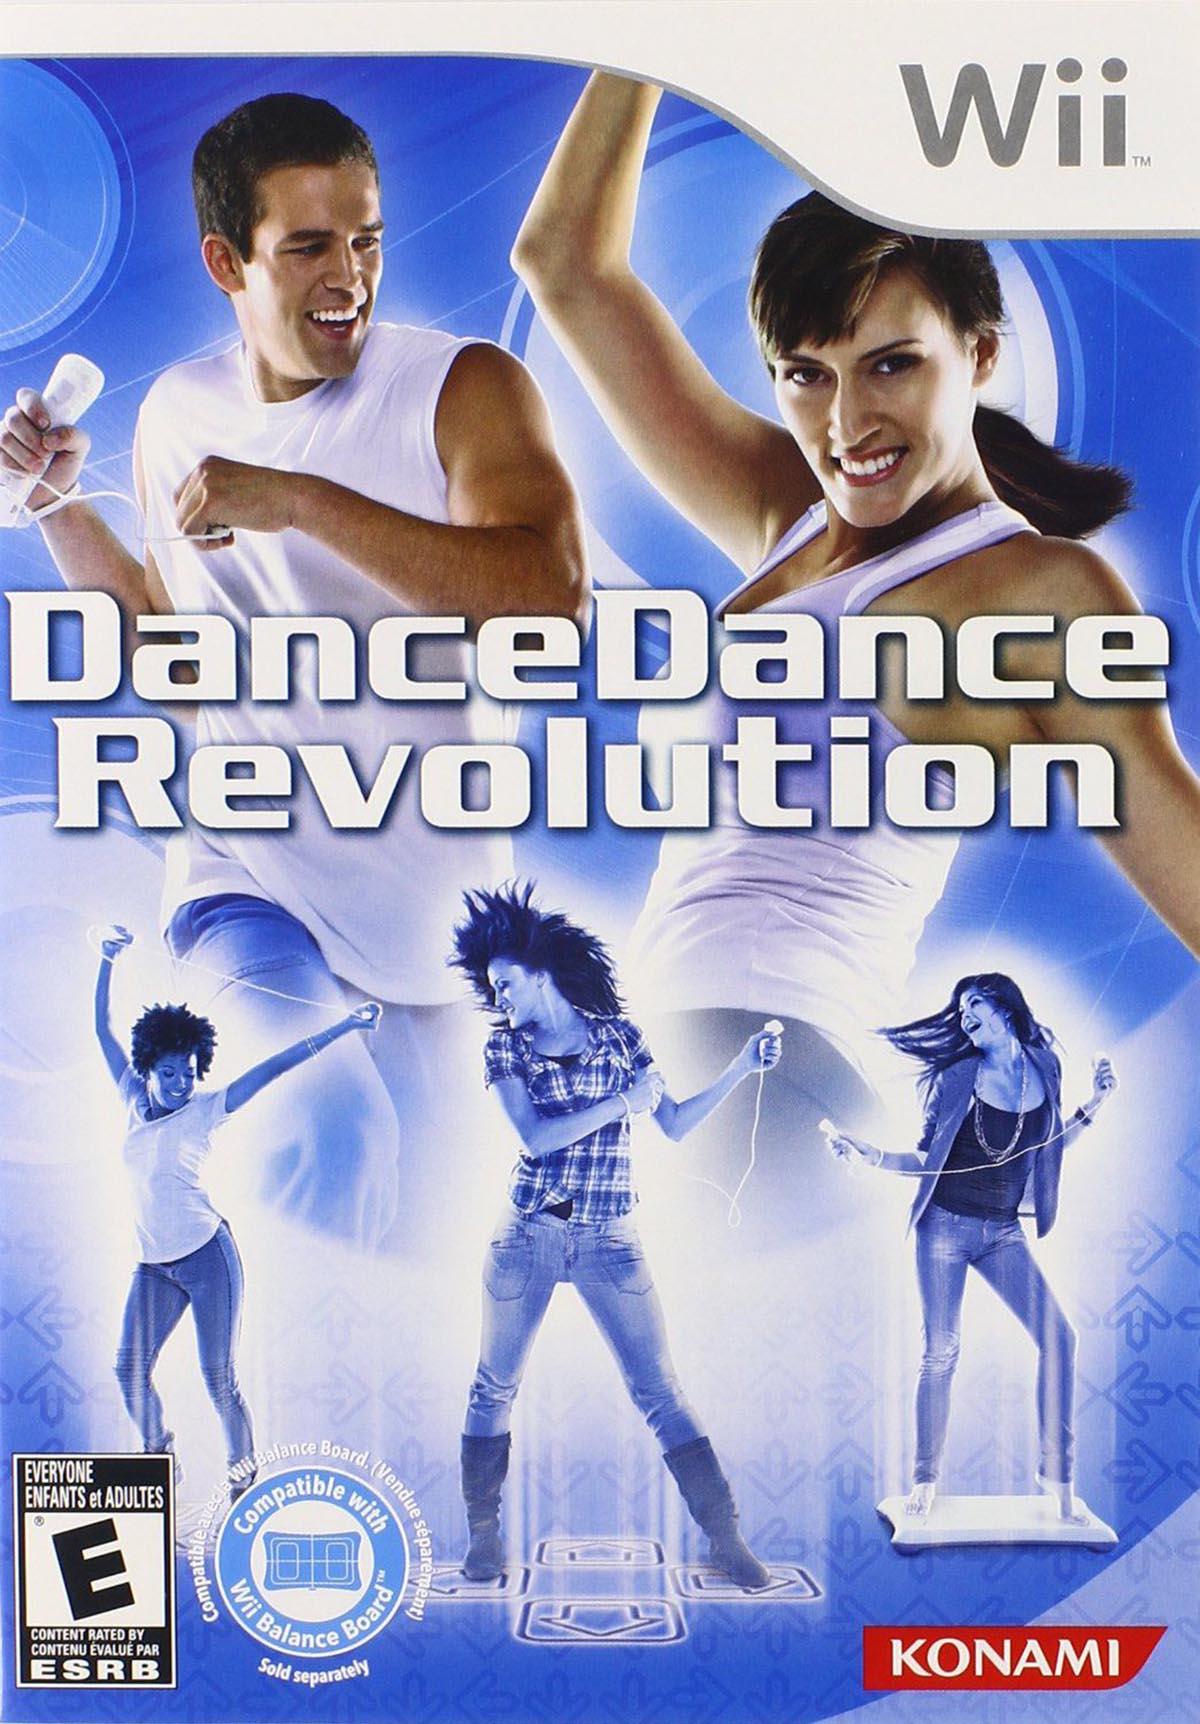 Review Dance Dance Revolution Slant Magazine